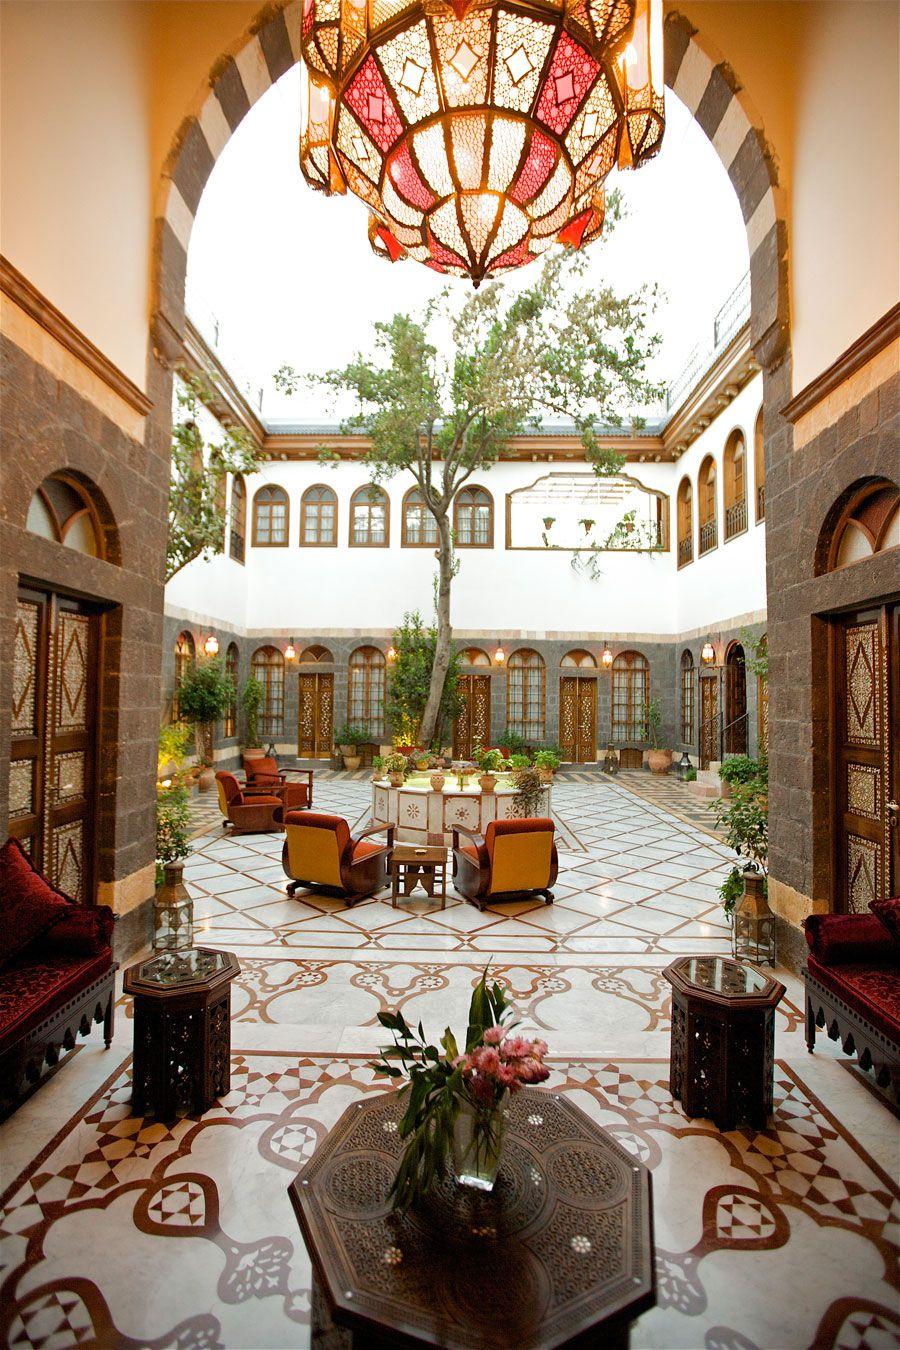 the liwan beit zafran hotel de charme damascus syria. Black Bedroom Furniture Sets. Home Design Ideas